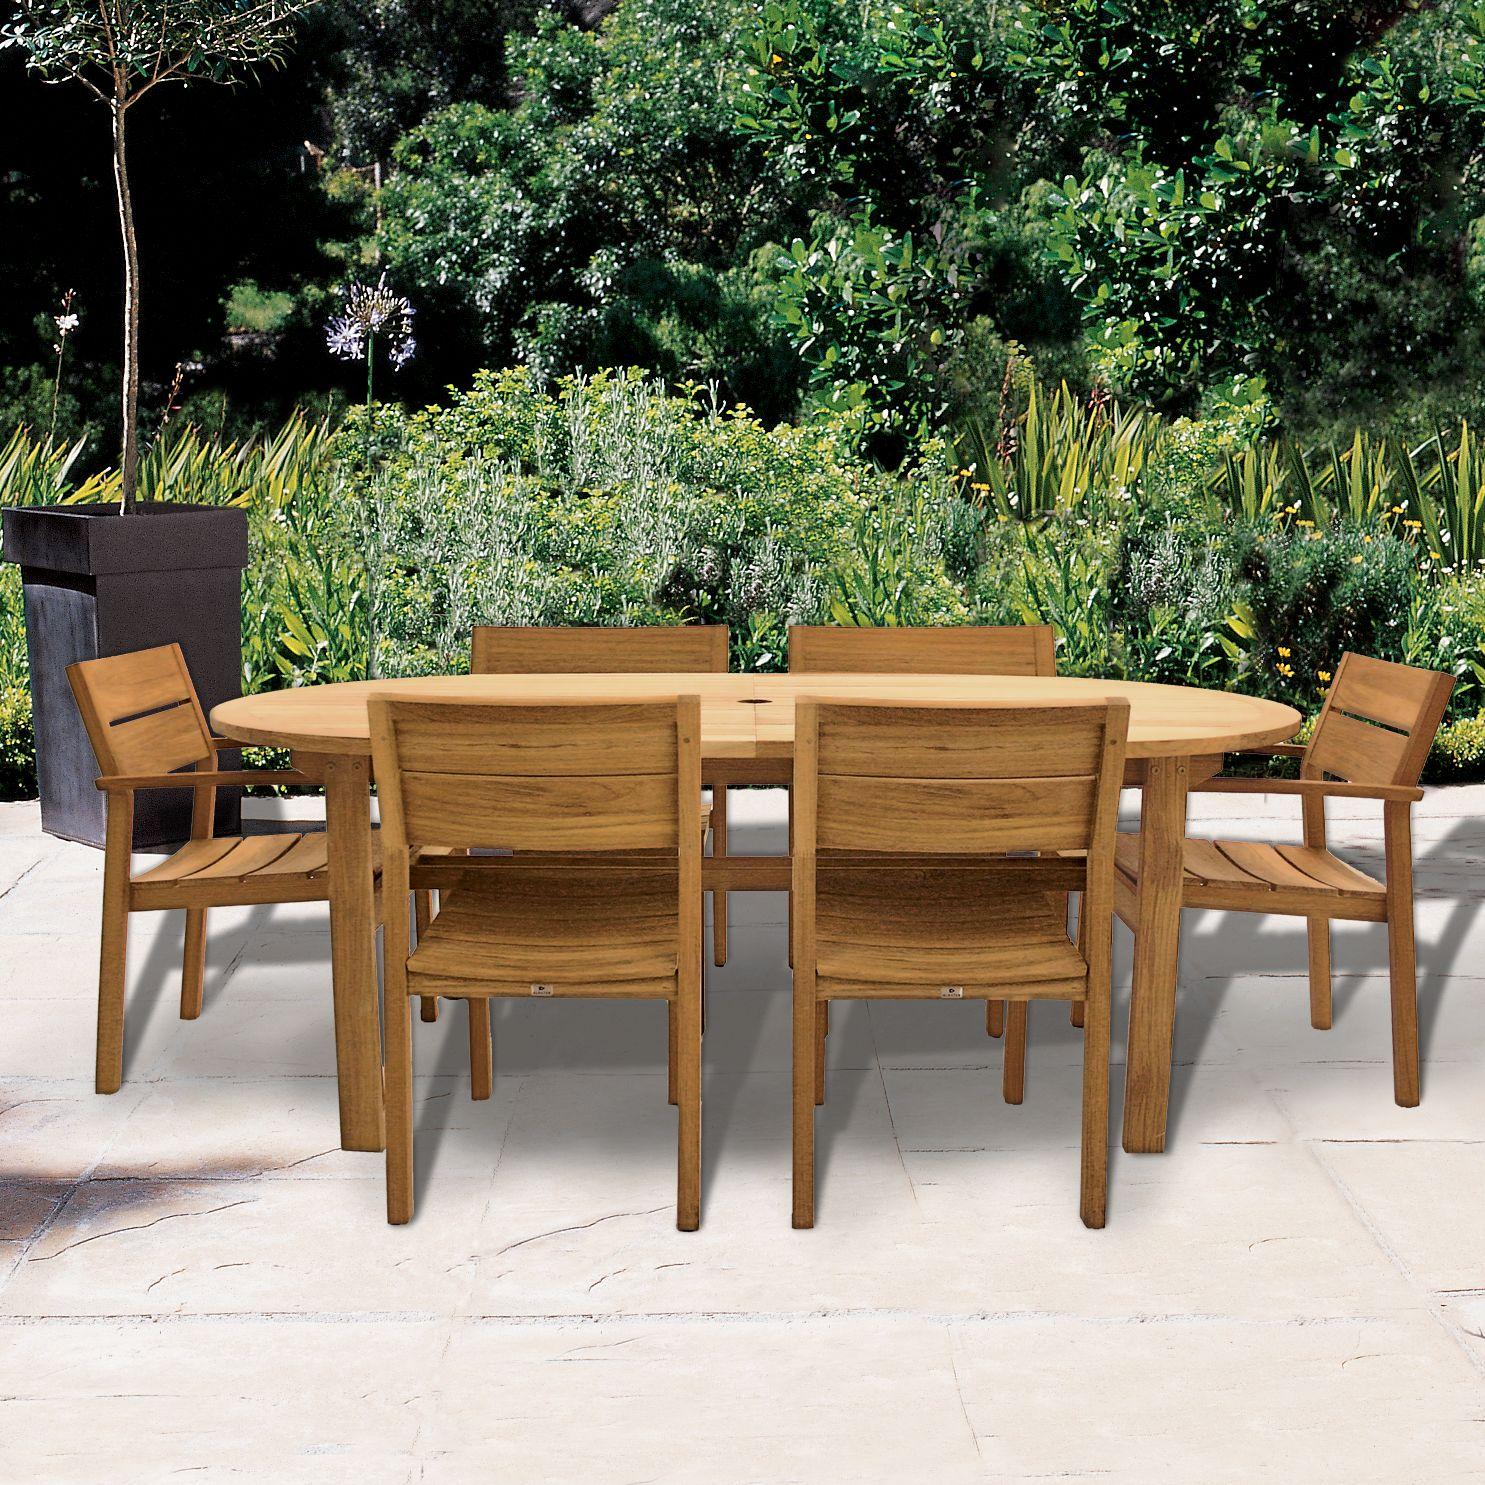 Gloster Rye Outdoor Furniture